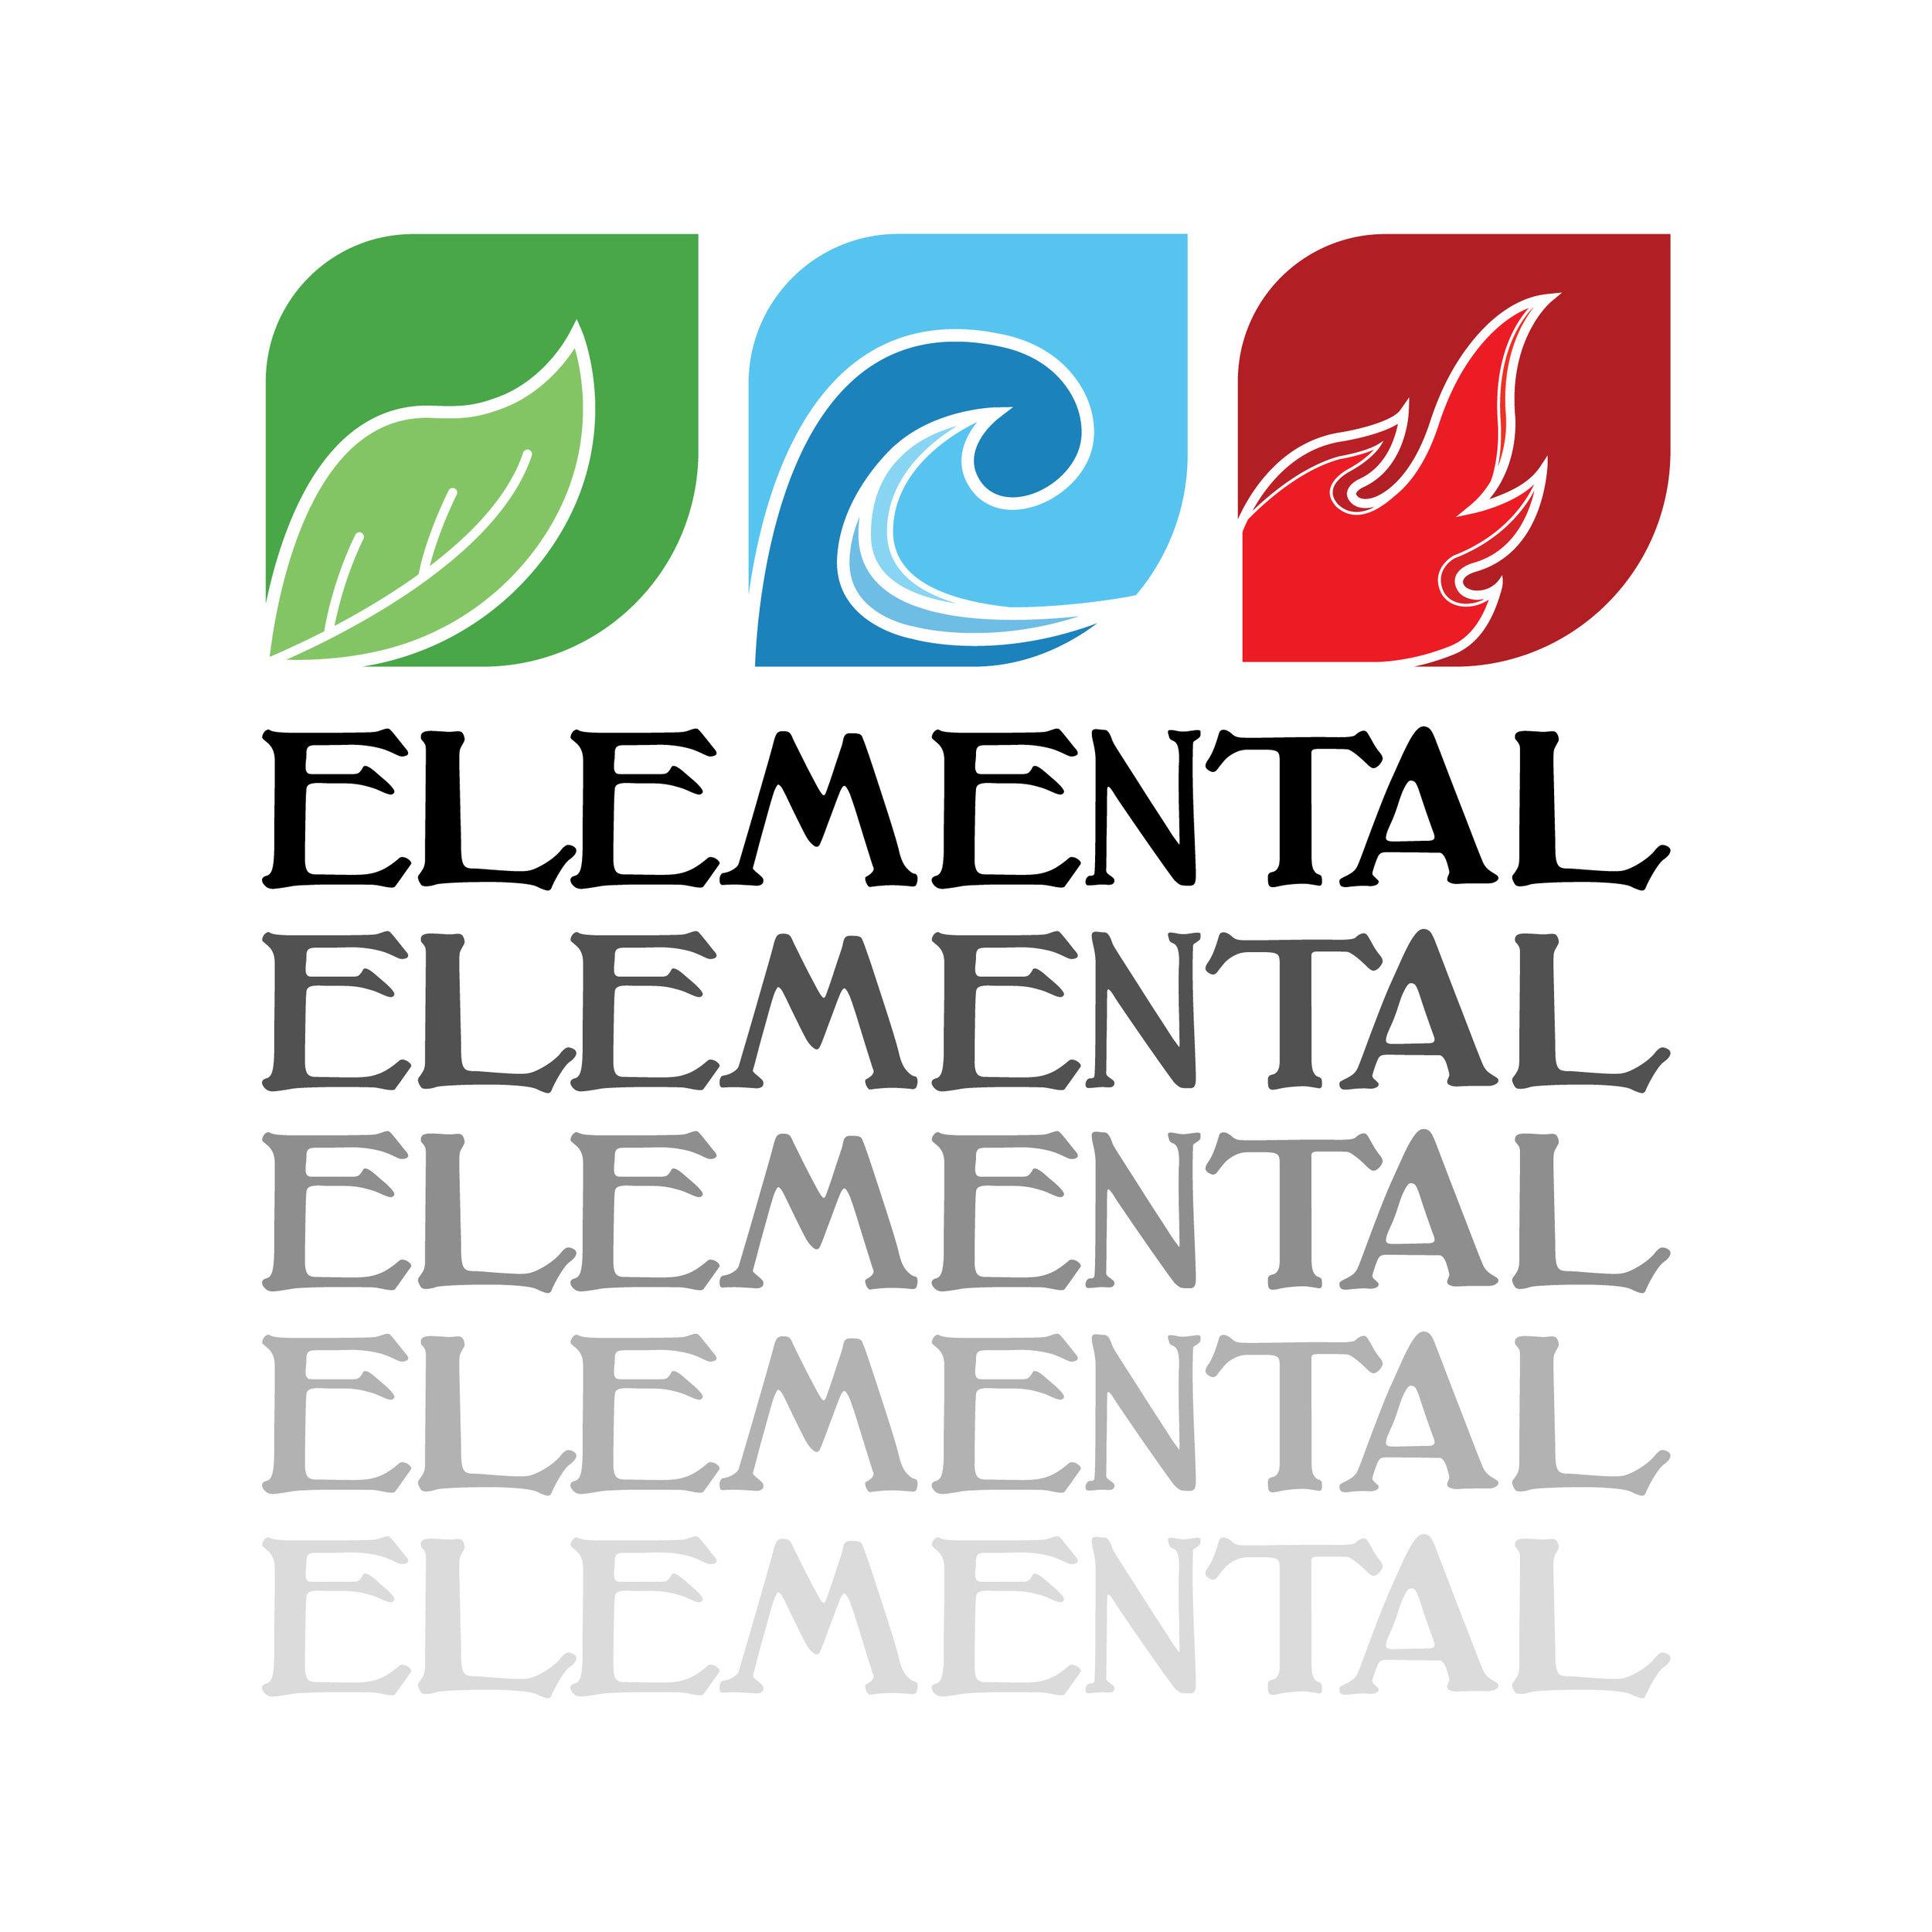 Elemental-13.jpg